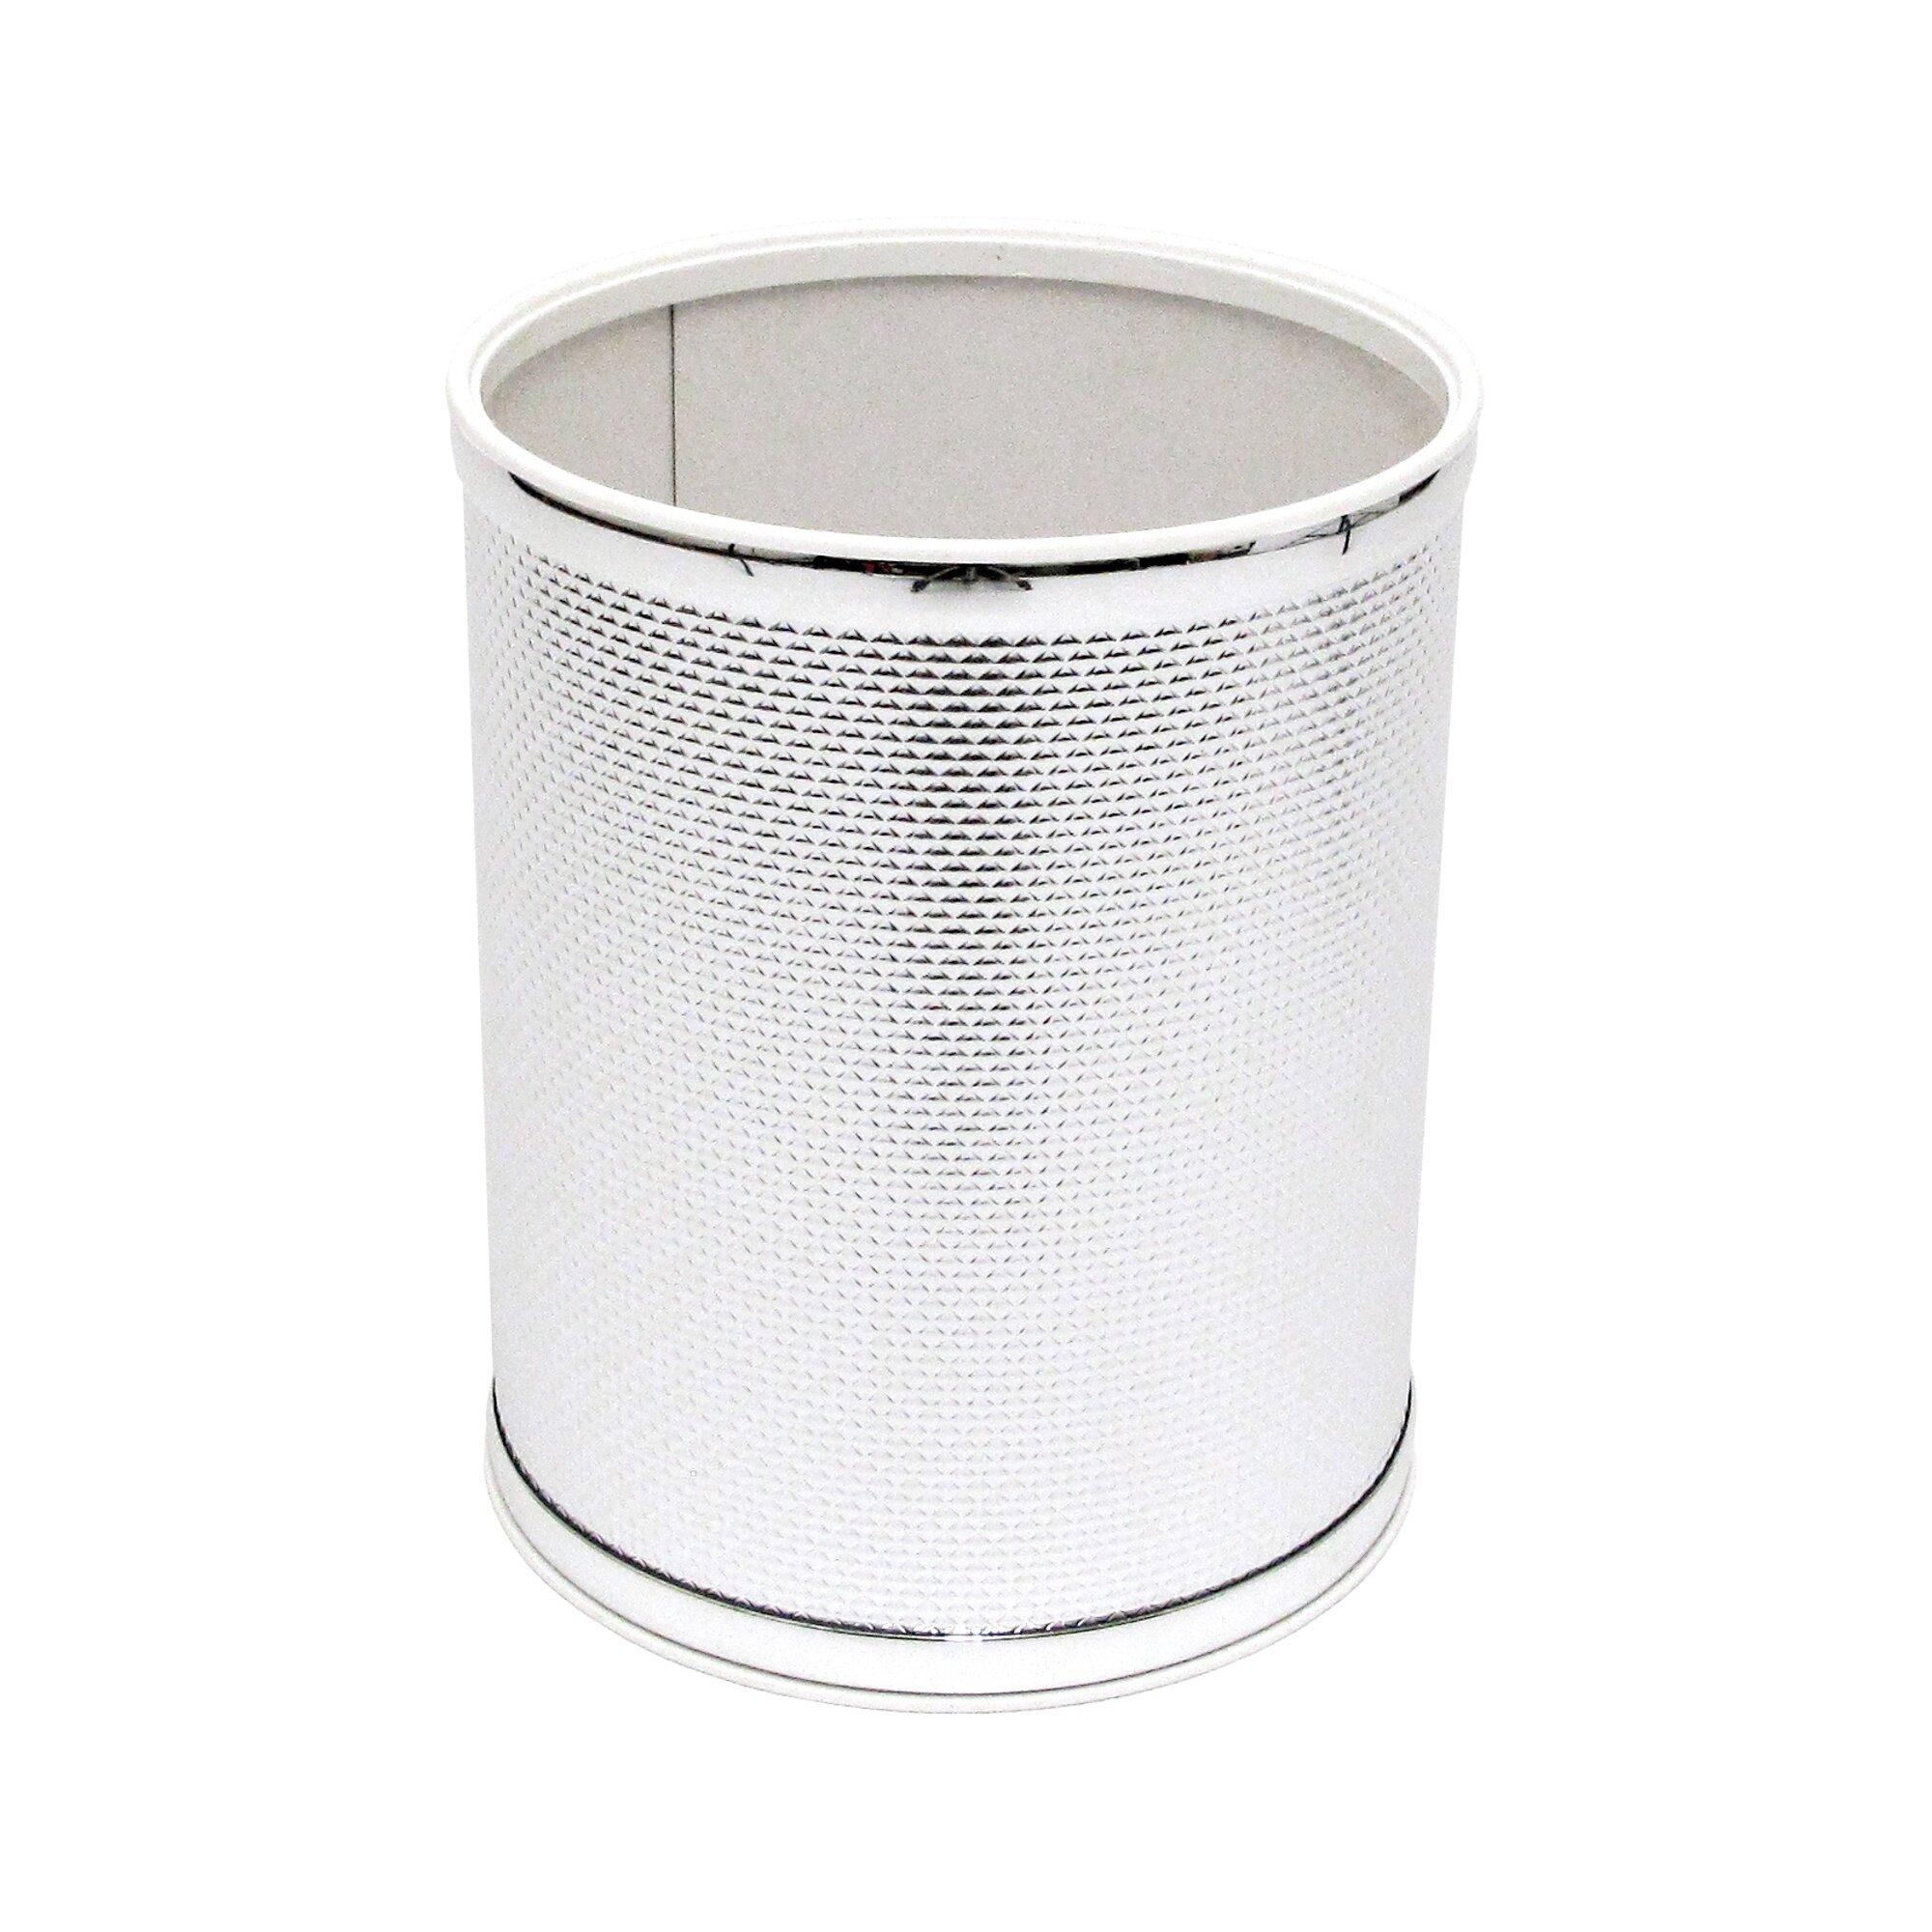 Redmon bath jewelry diamond pattern round wastebasket for Bathroom wastebasket